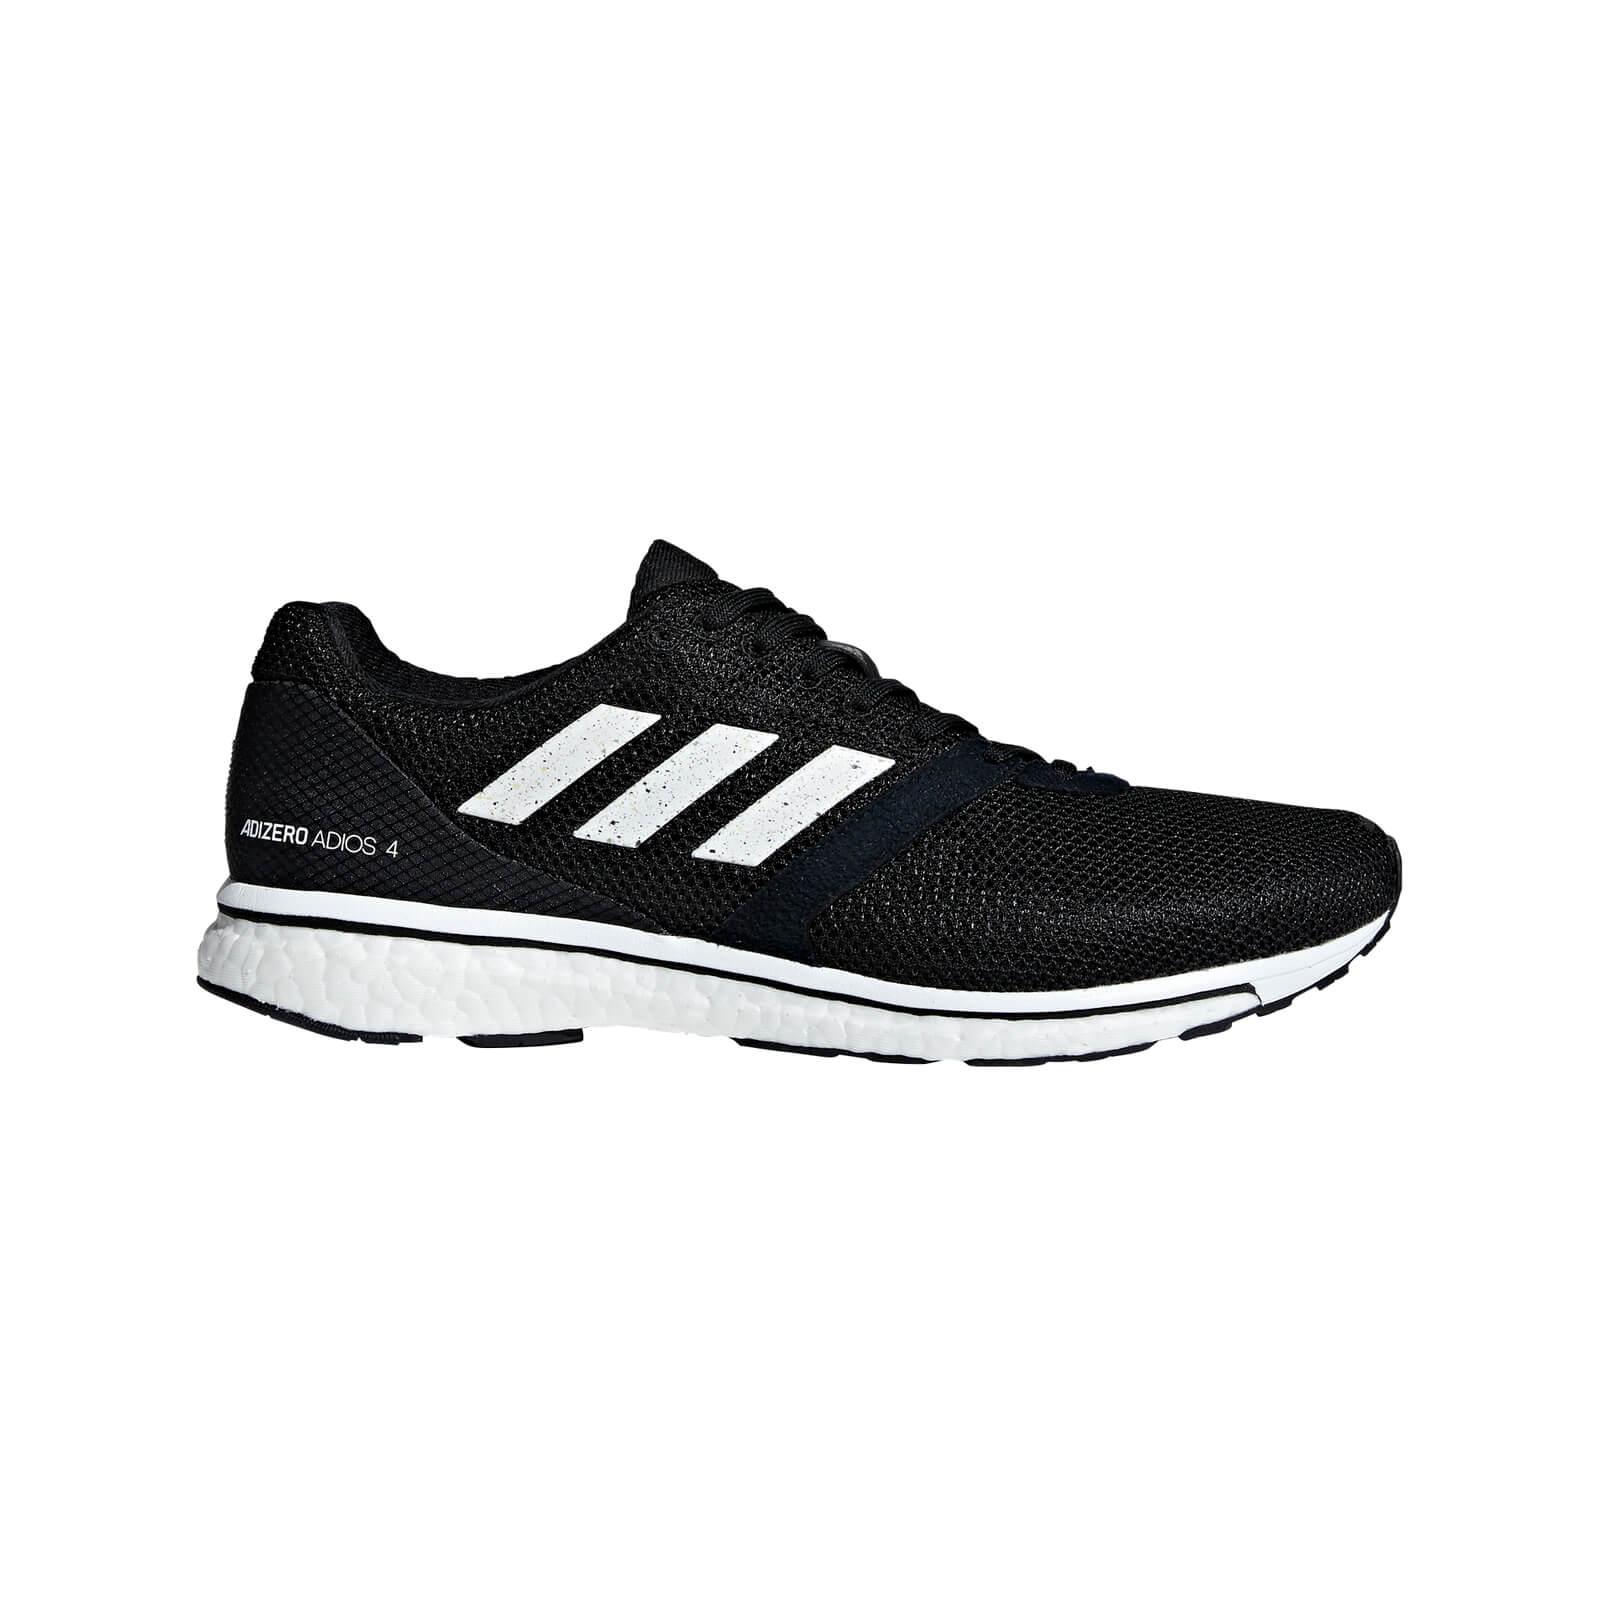 adidas Adizero Adios 4 Running Shoes - Black - US 12/UK 11.5